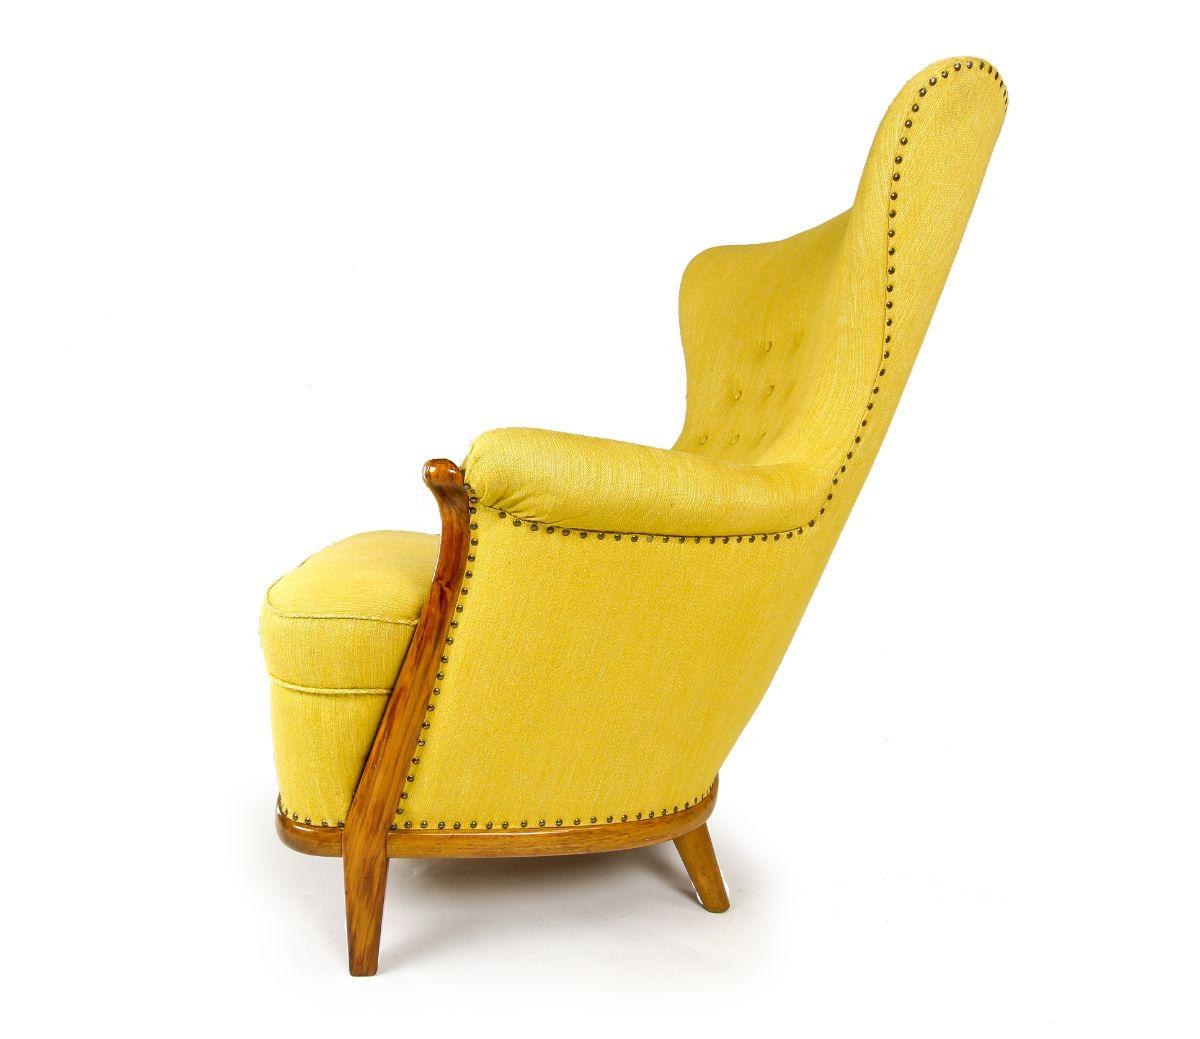 Yellow Wool chair mid century furniture Swedish chair 1950's